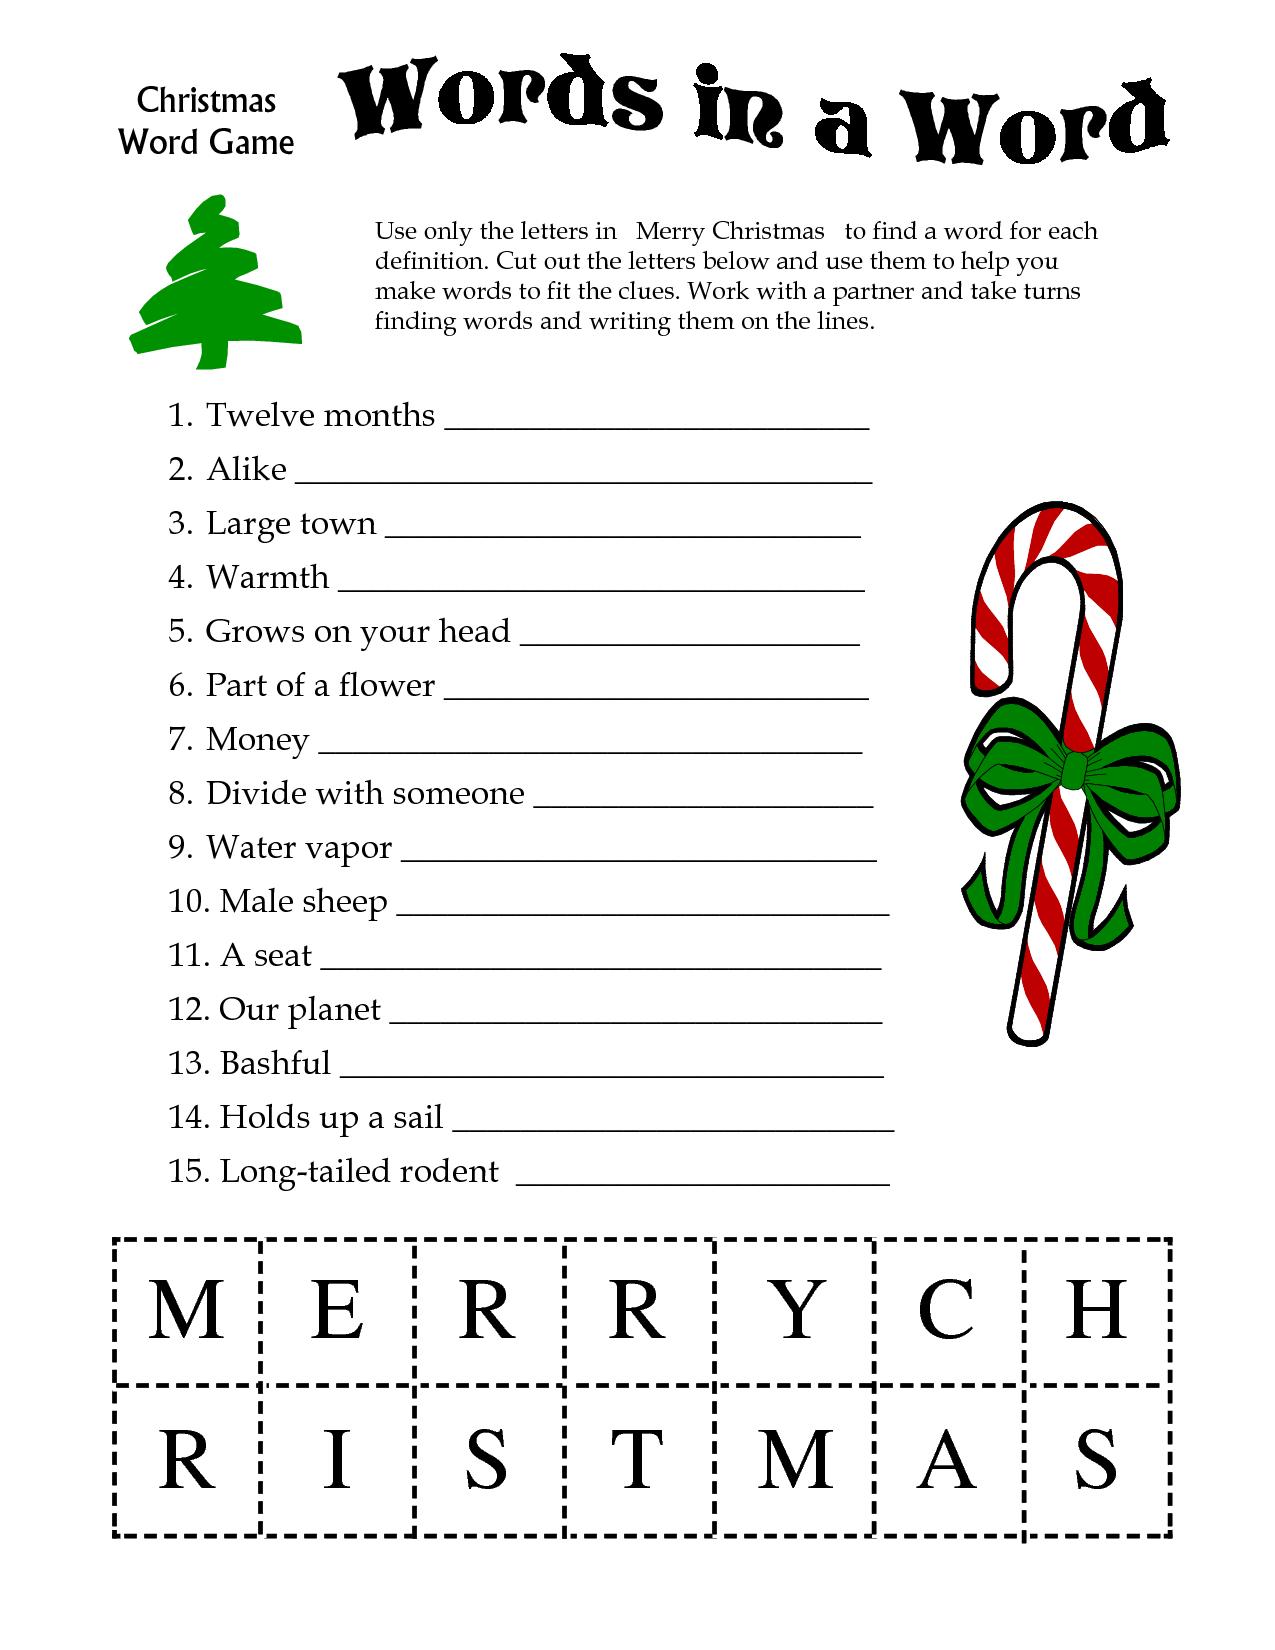 5 Images Of Free Printable Christmas Word Games | Printablee - Free Games For Christmas That Is Printable